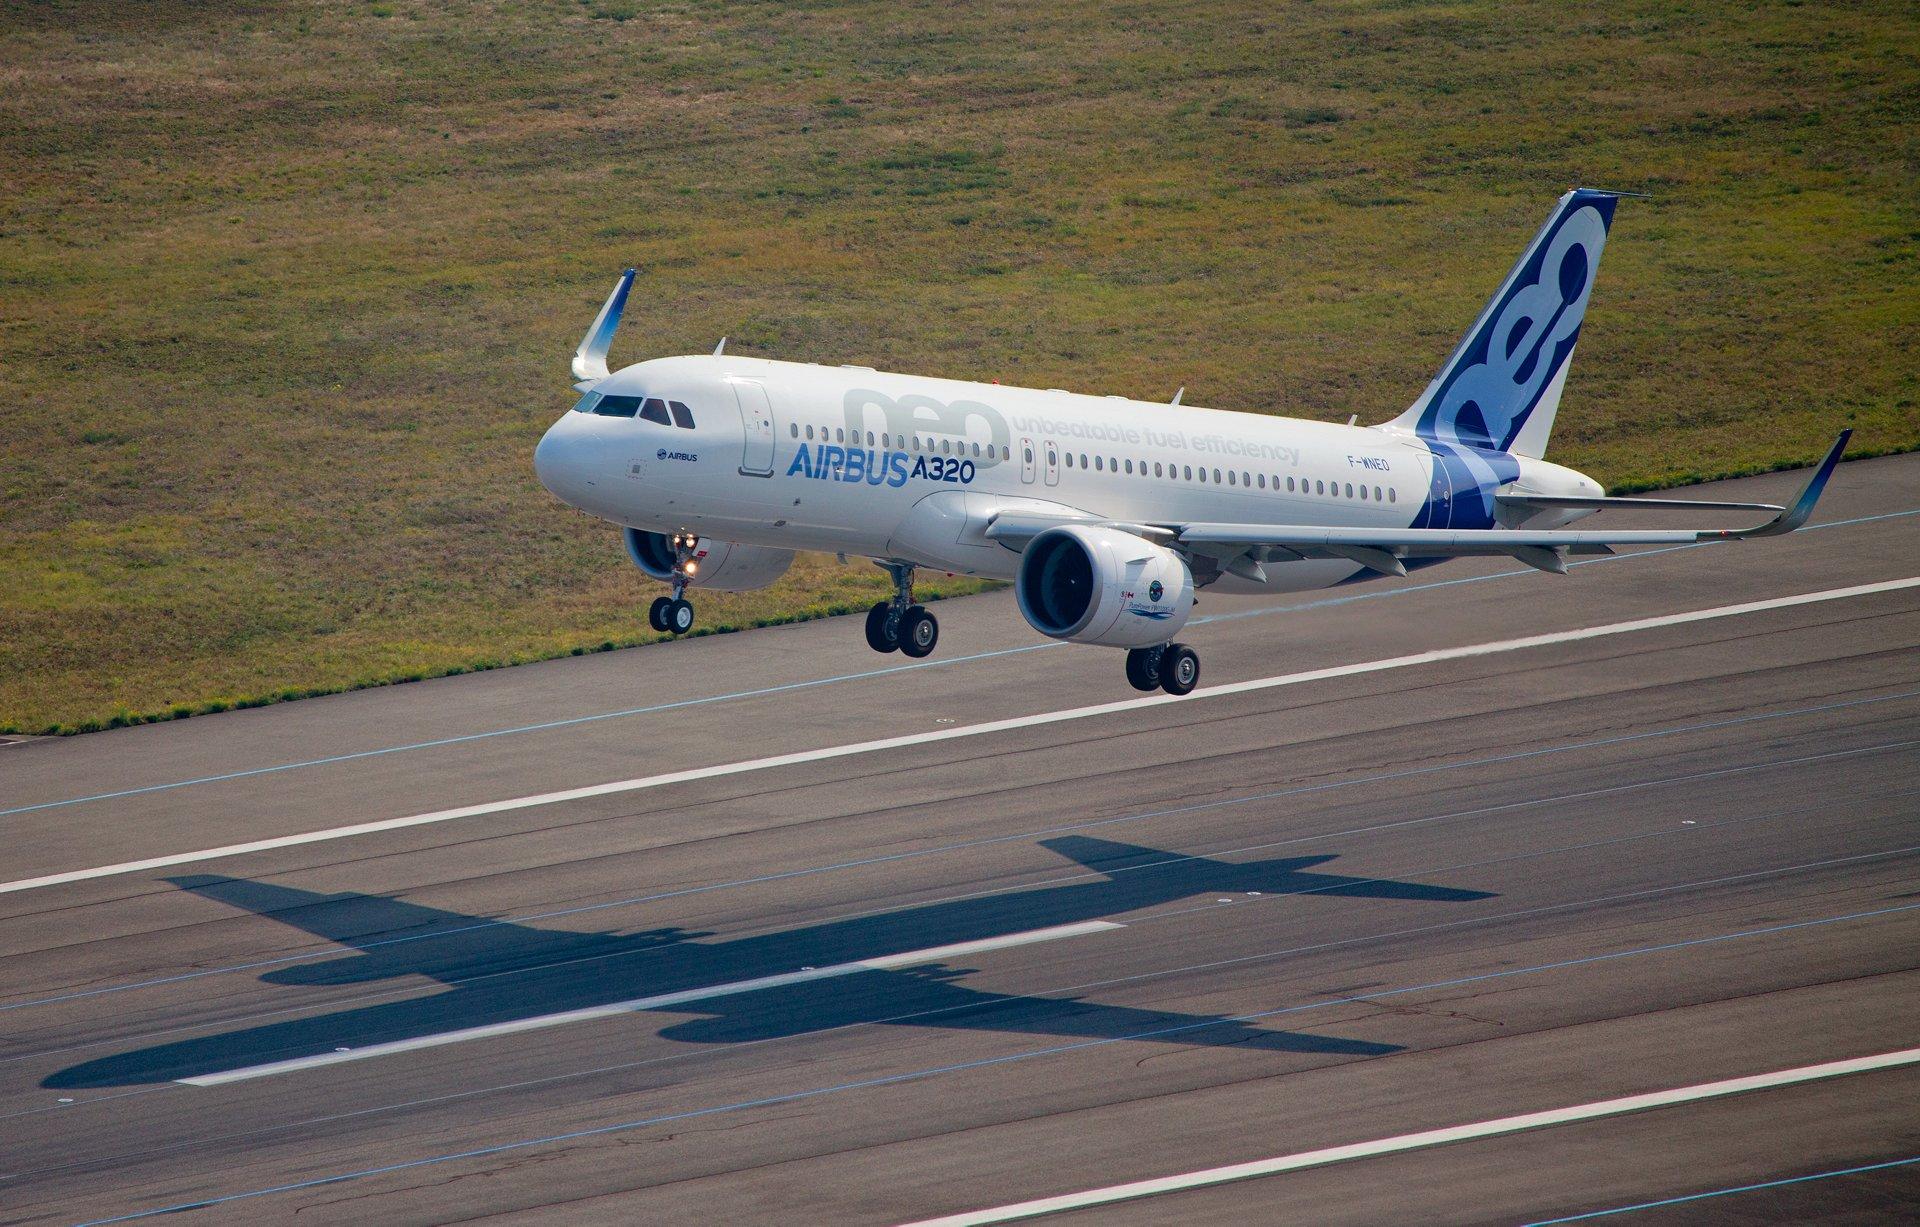 Seeking the most energy efficient flight